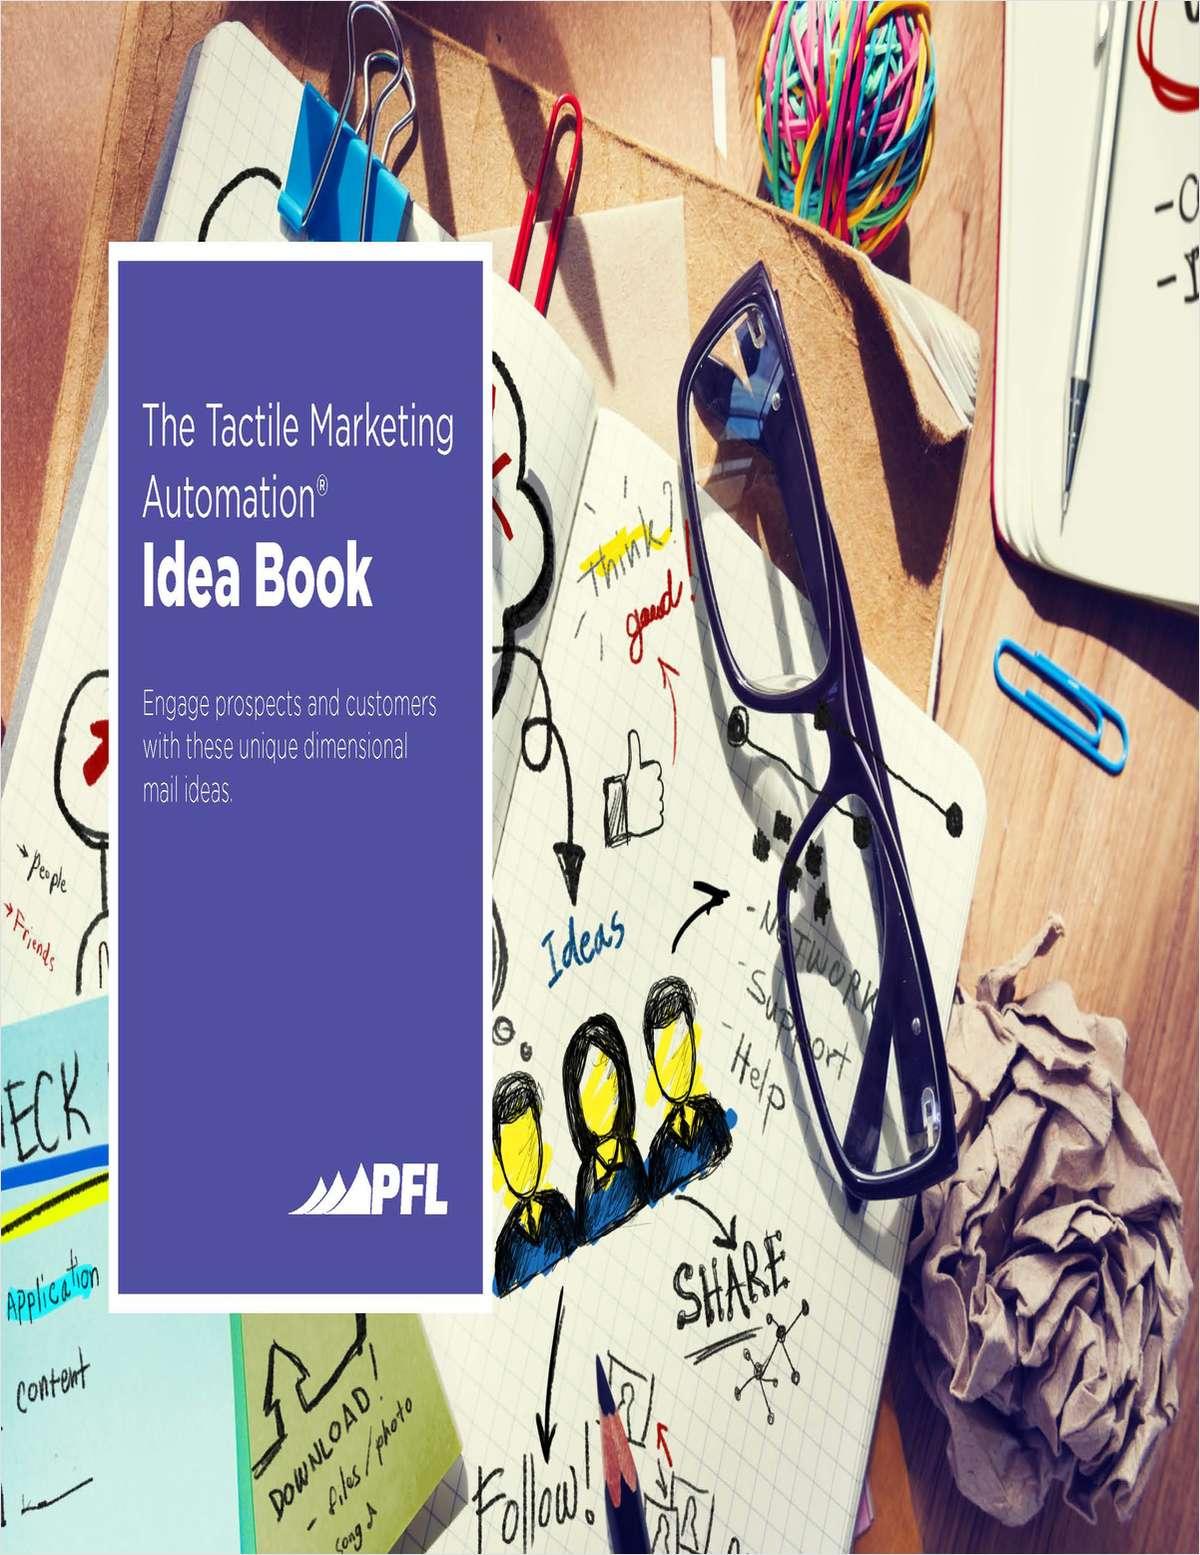 Tactile Marketing Idea Book